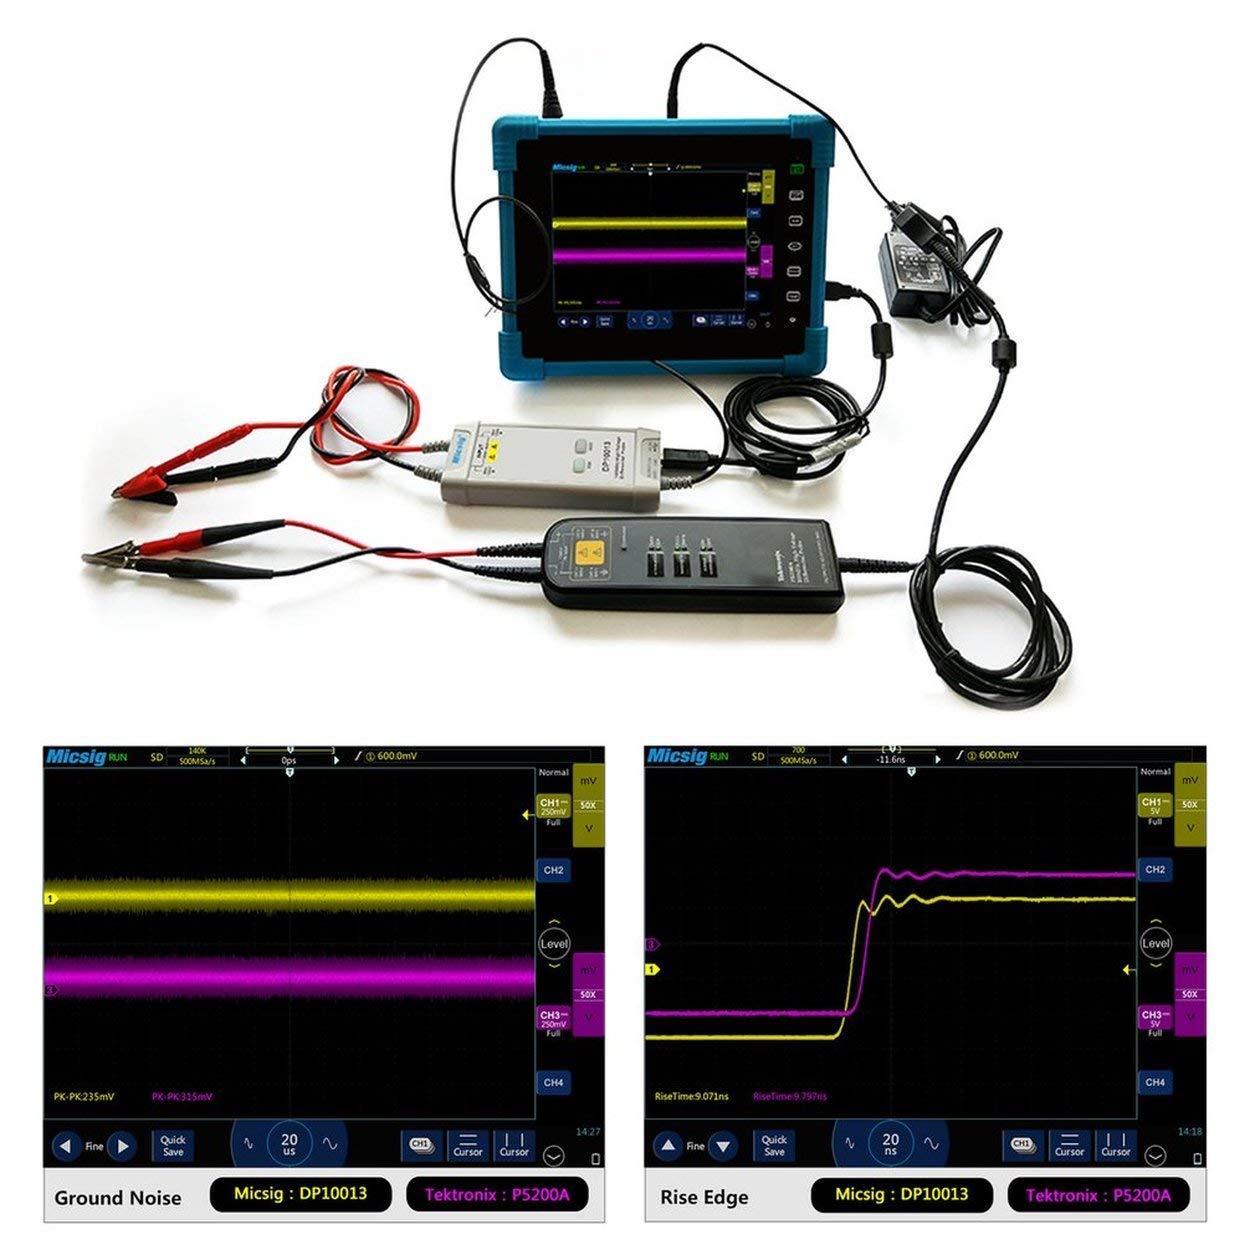 Micsig Oscilloscope 1300V 100MHz High Voltage Differential Probe Kit DP10013 B07KM8QGB8